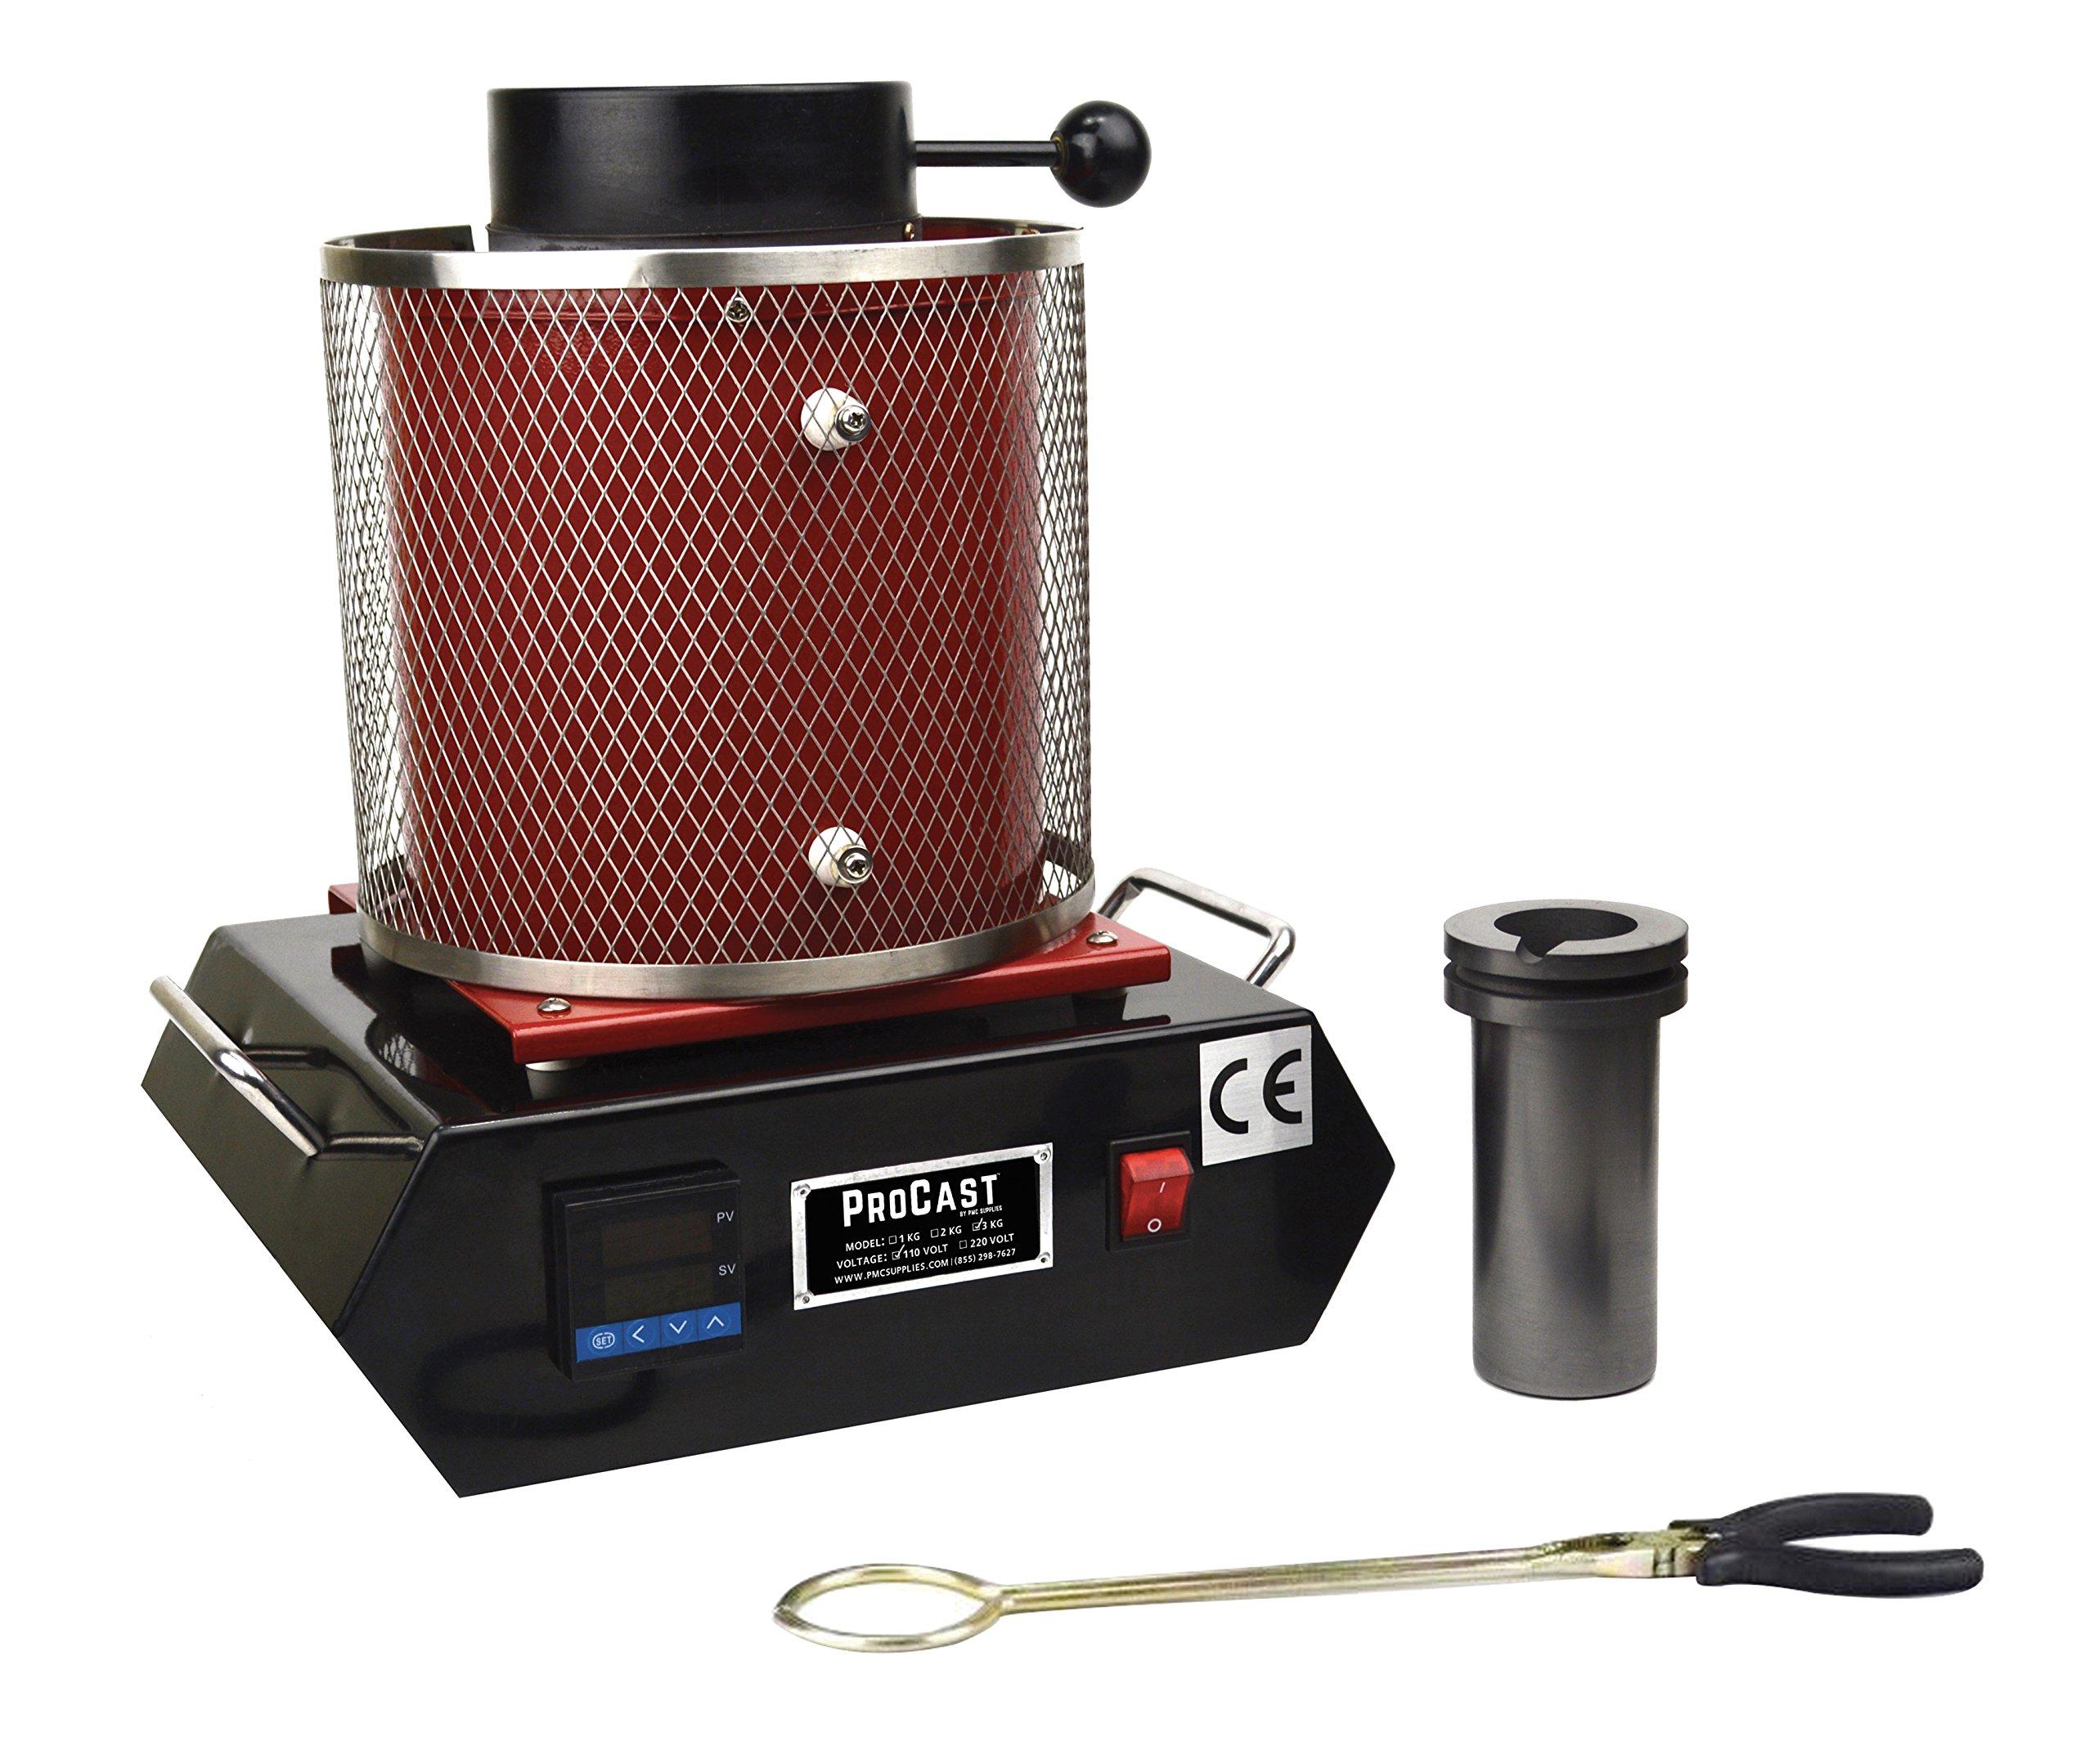 ProCast 3 KG Gold Melting Furnace Machine U.S. 110V Kiln Casting Refining Precious Metals Melts Gold Silver Tin Aluminum 2102°F by PMC Supplies LLC